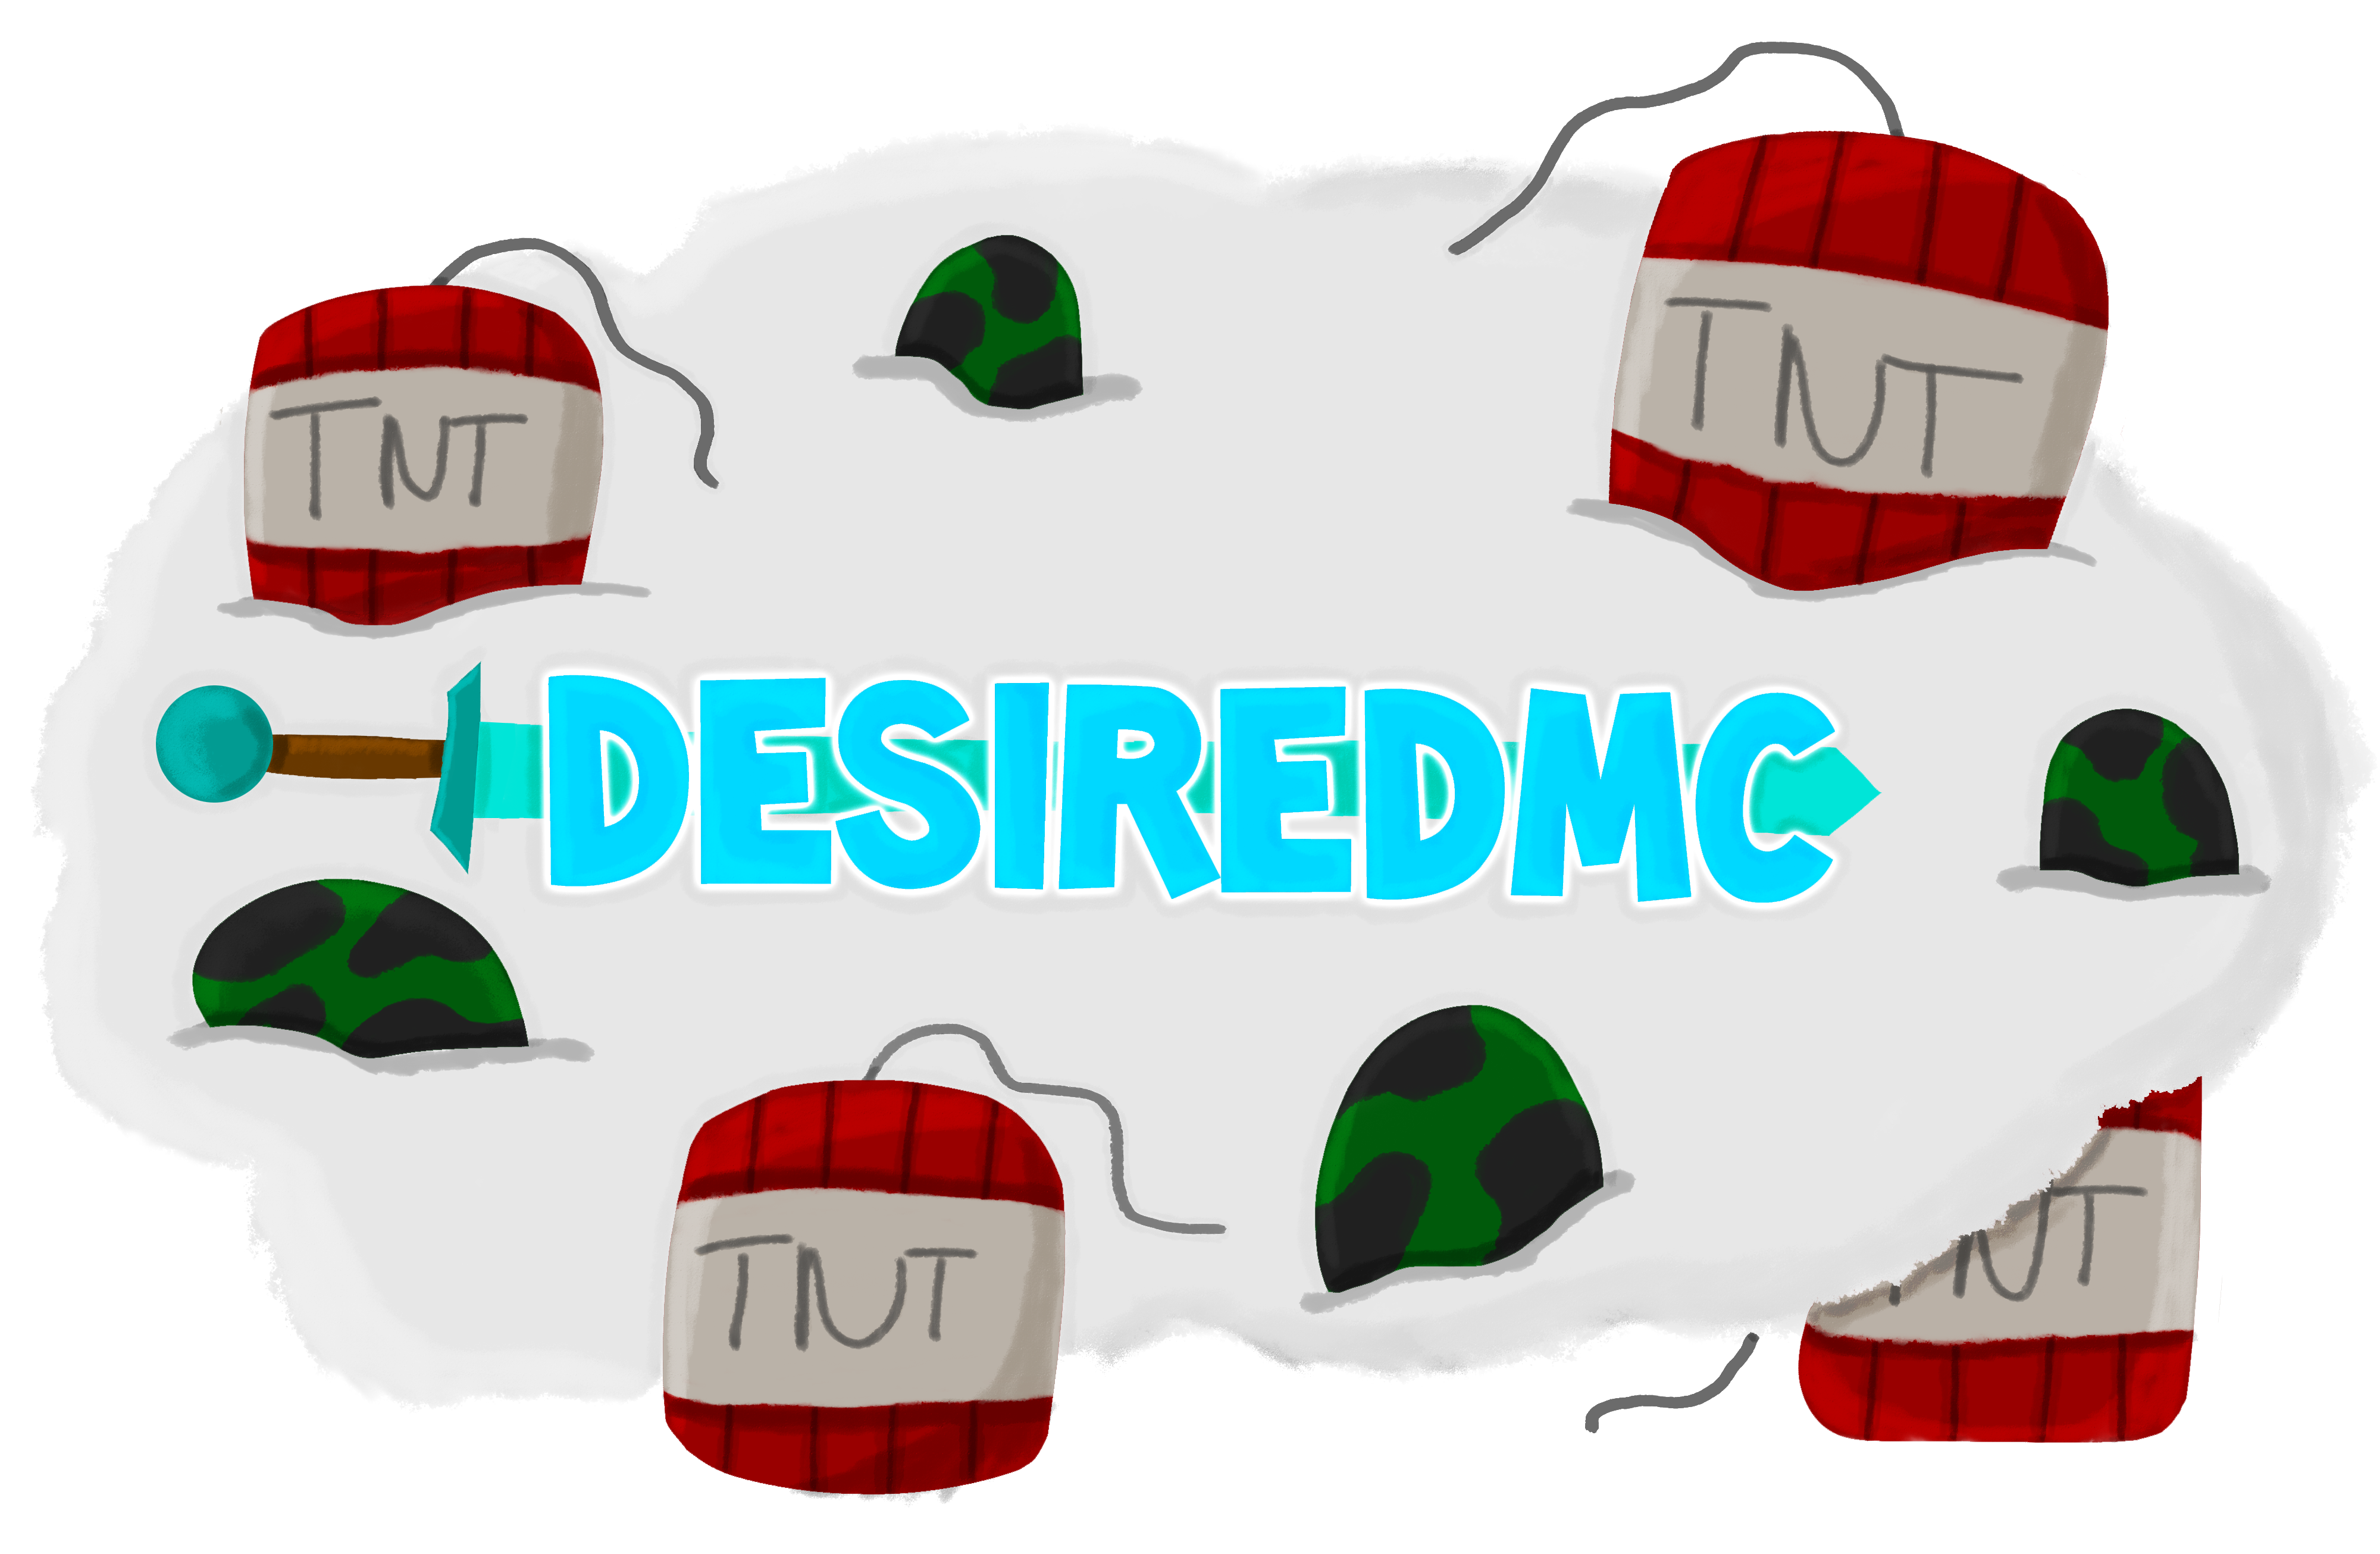 DesiredMC